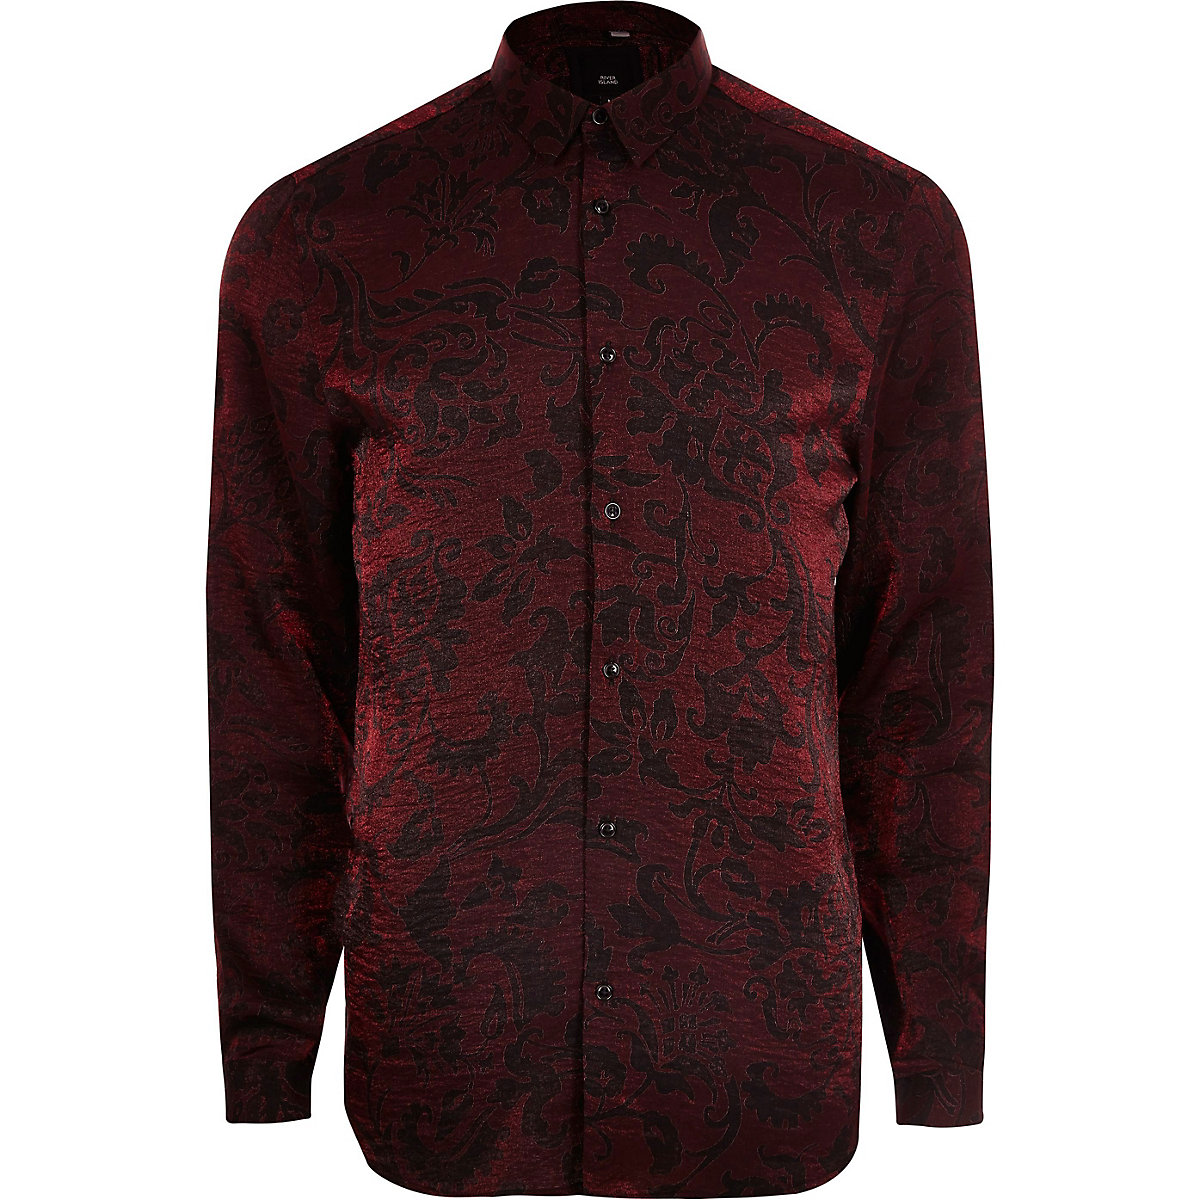 Big and Tall red metallic print button shirt